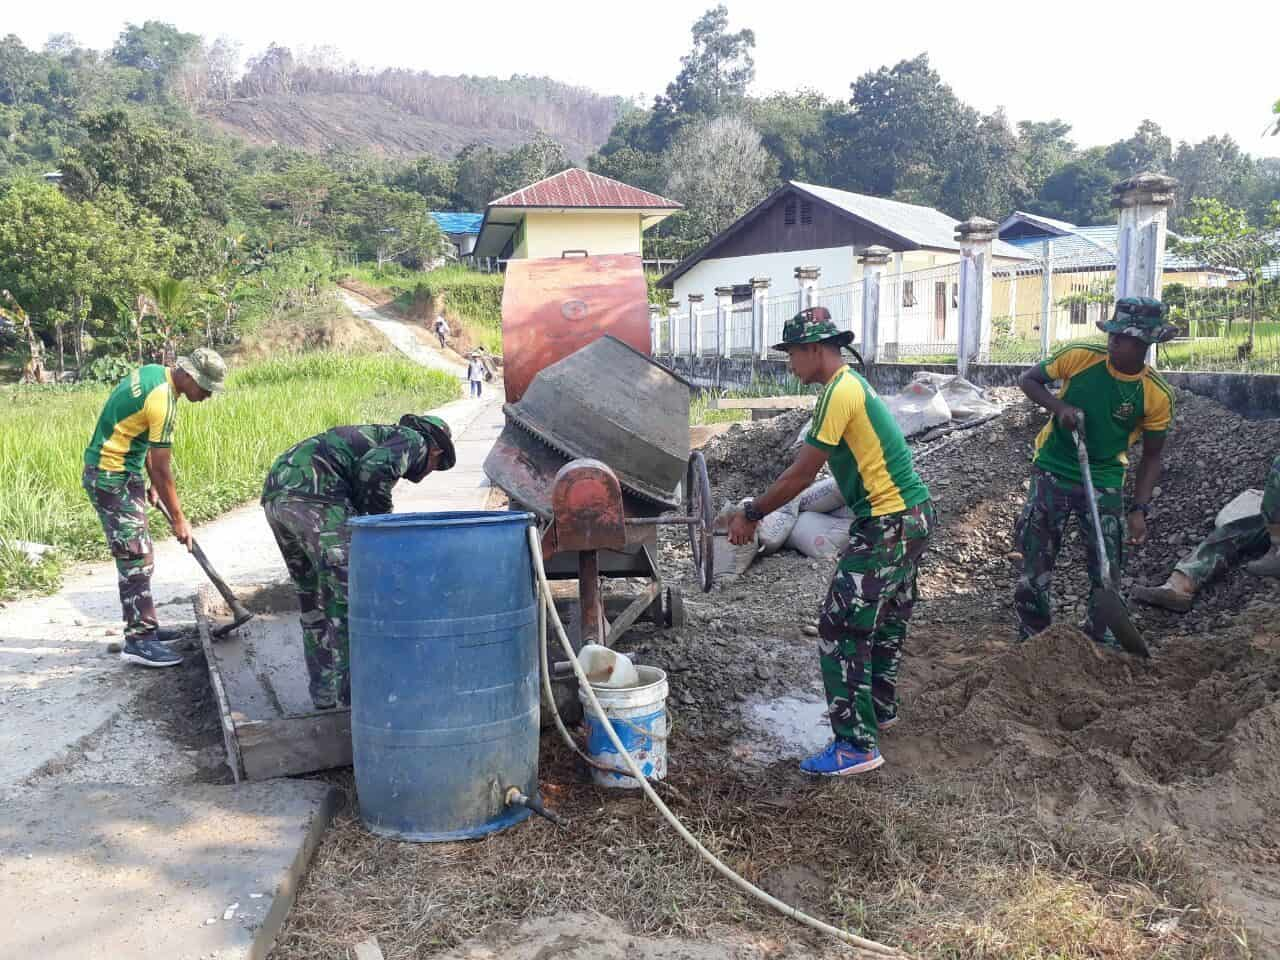 Licin dan Sulit Dilalui, Satgas Pamtas Yonif R 303 Perbaiki Jalan Long Pujungan